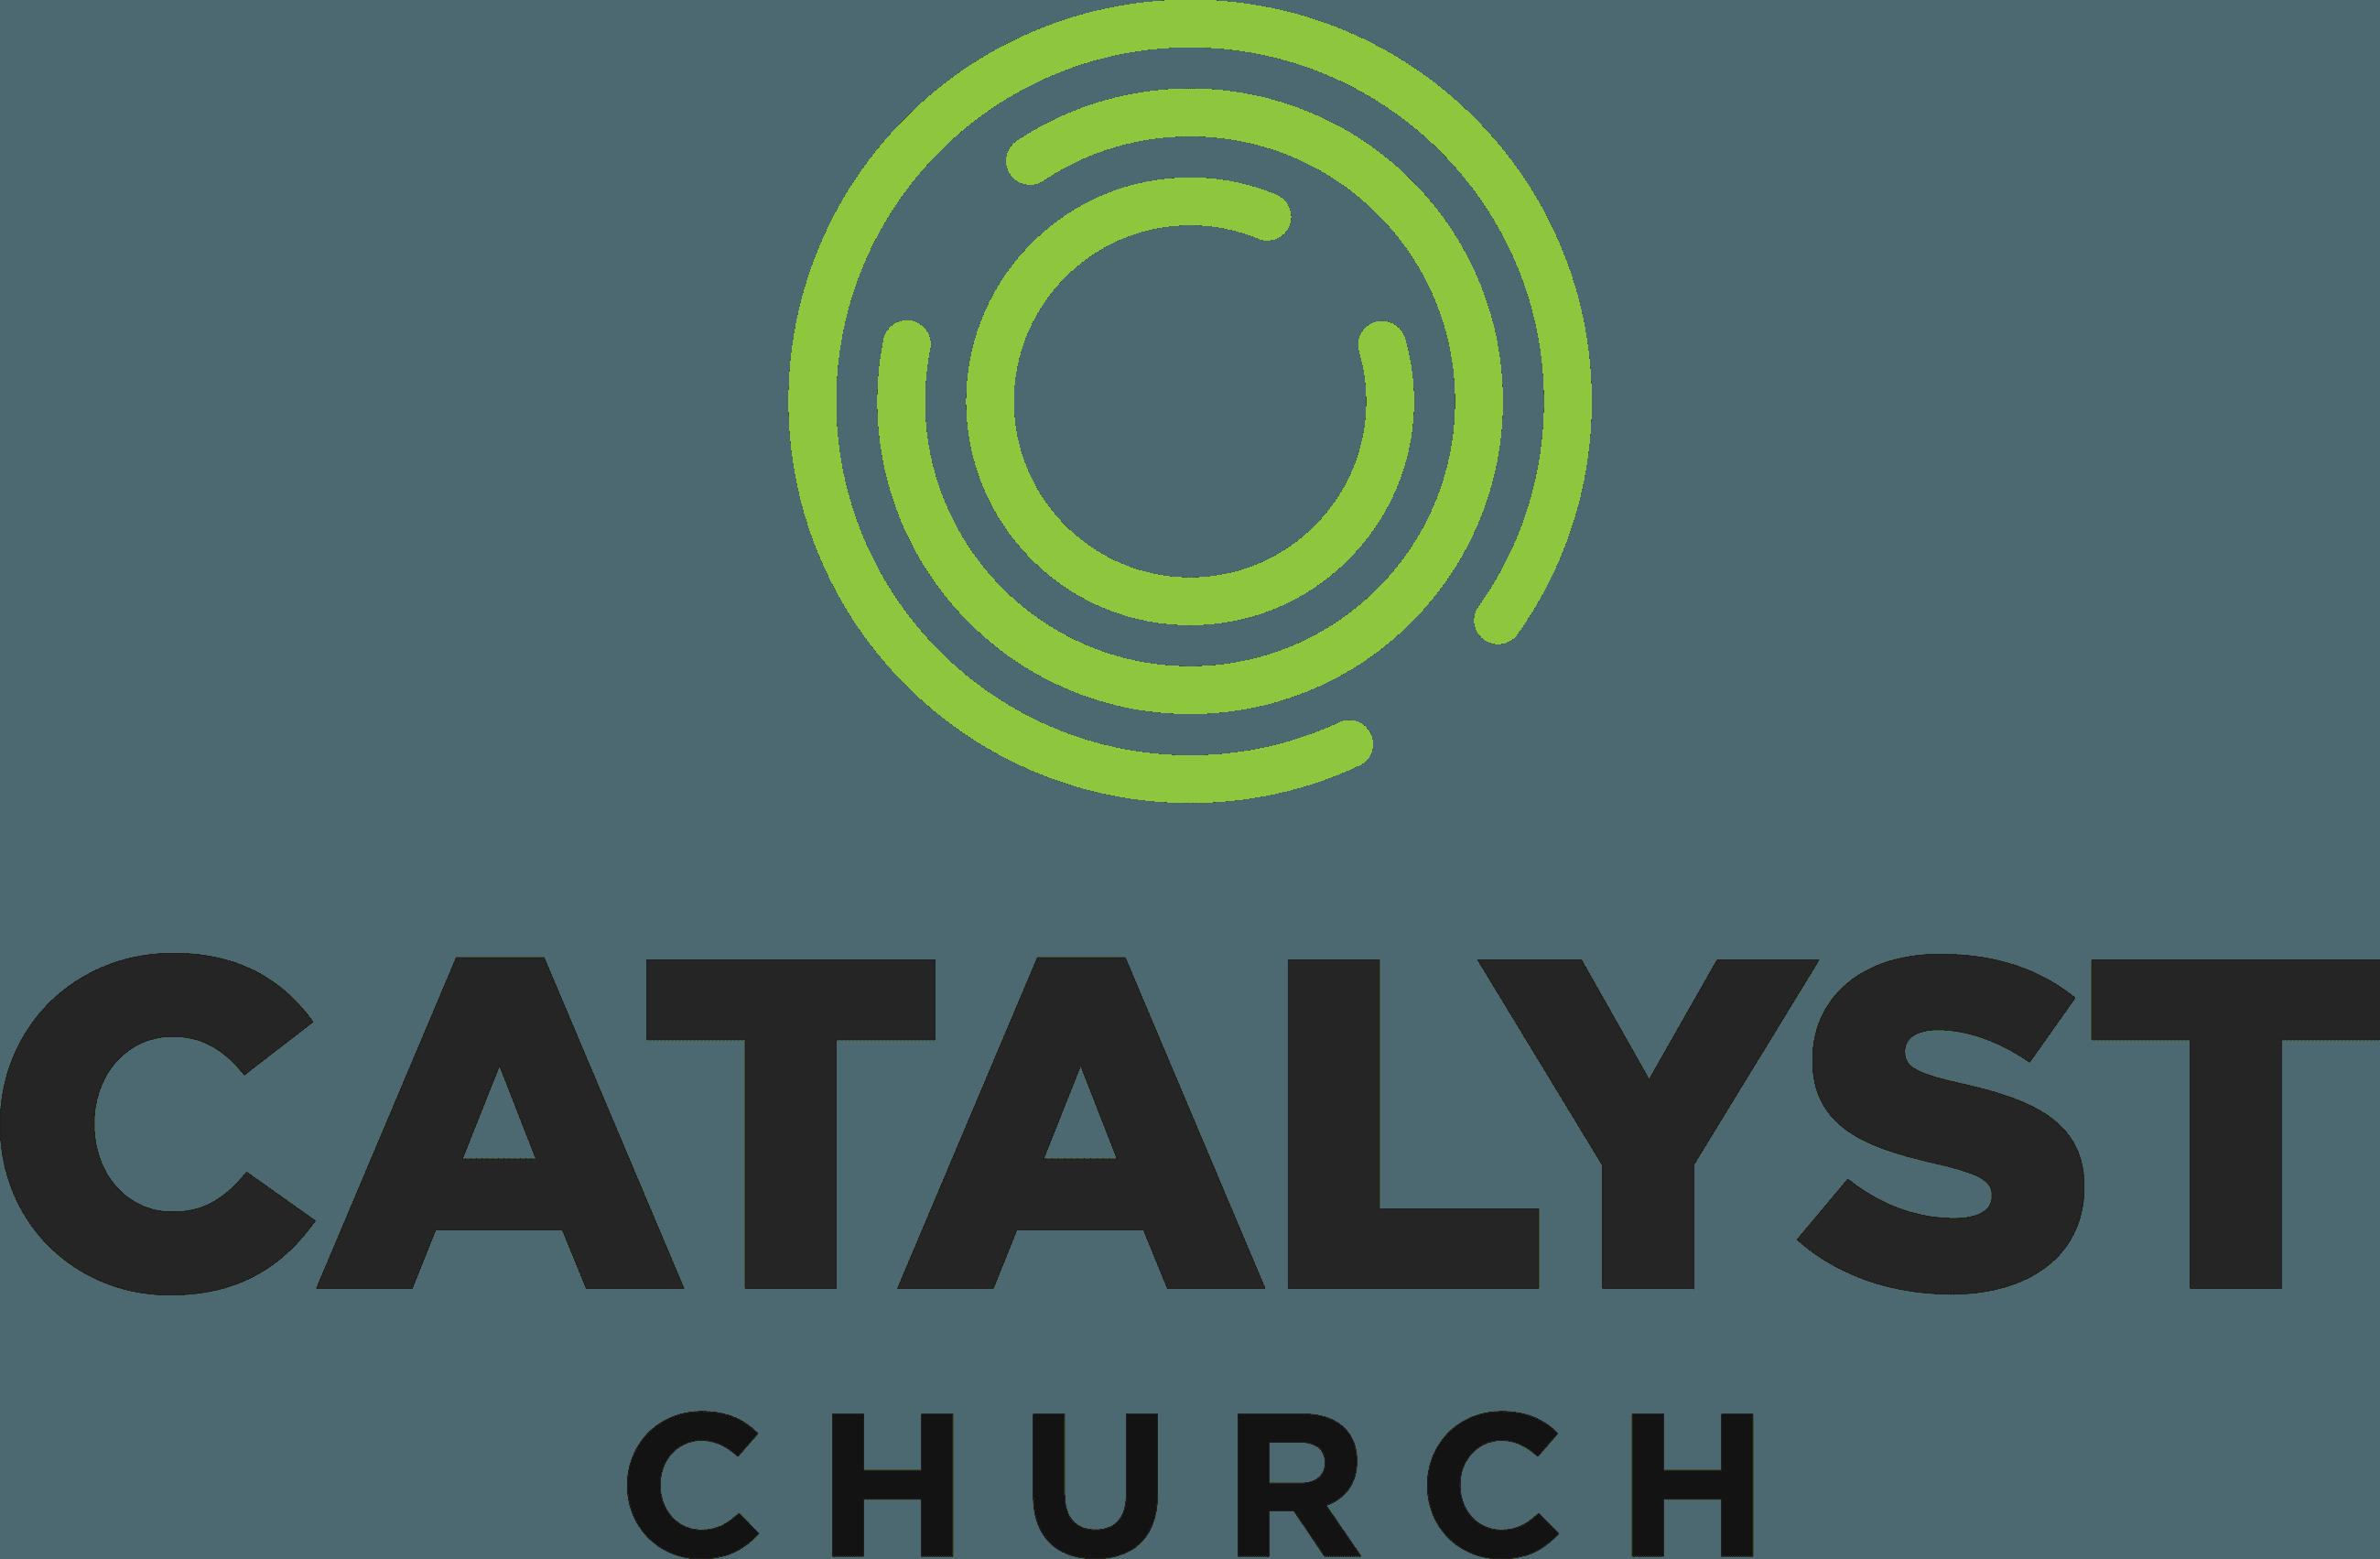 Catalyst Church logo Opens in new window